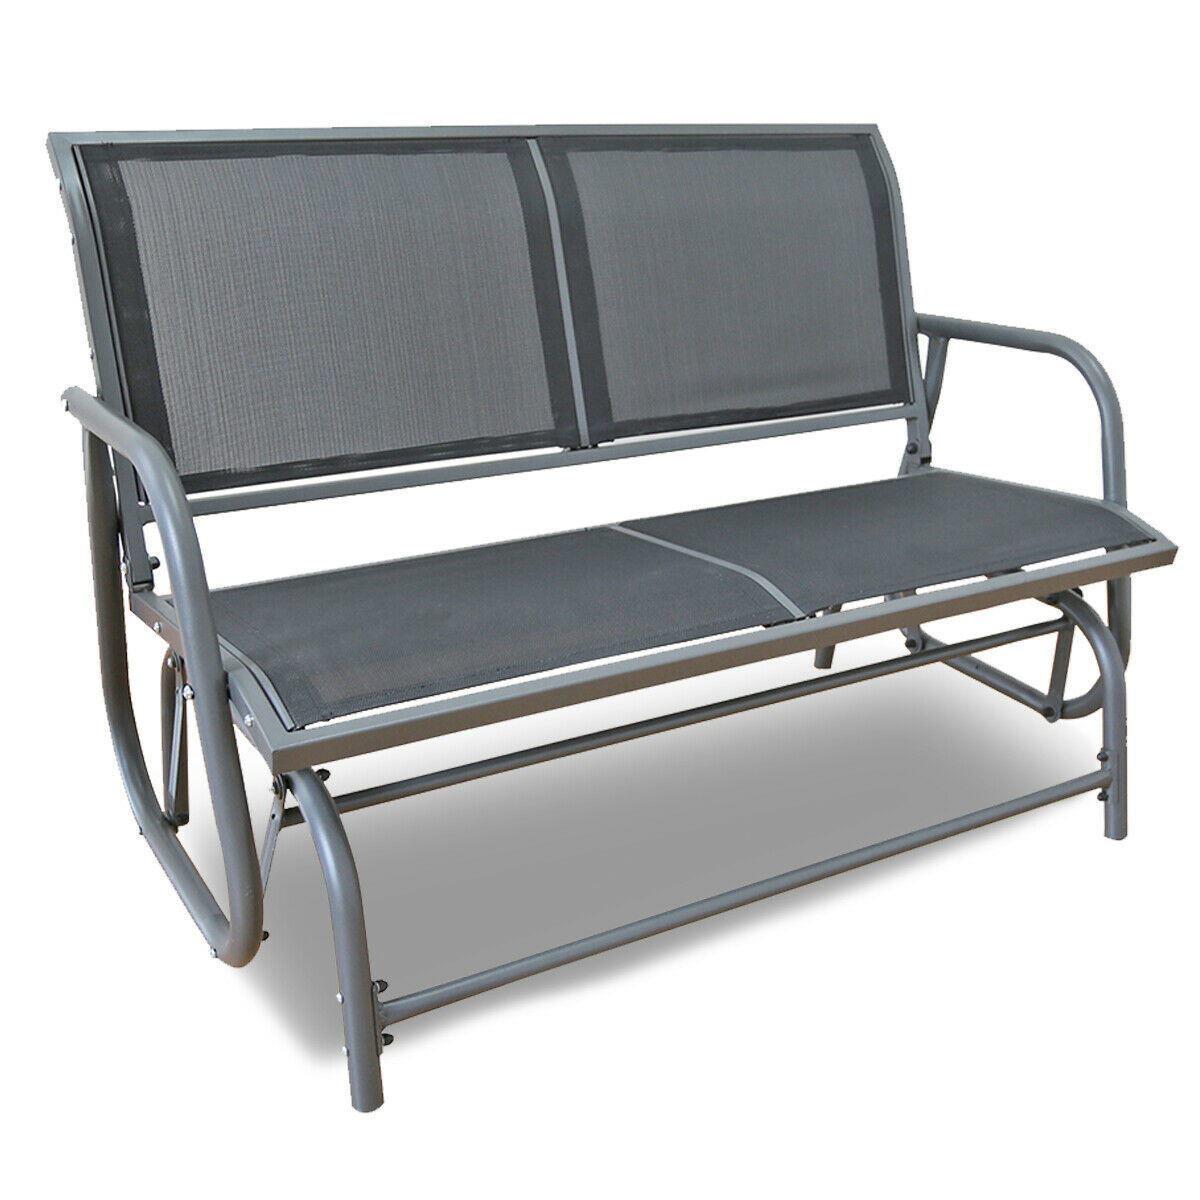 Picture of Outdoor Swing Bench - Dark Gray